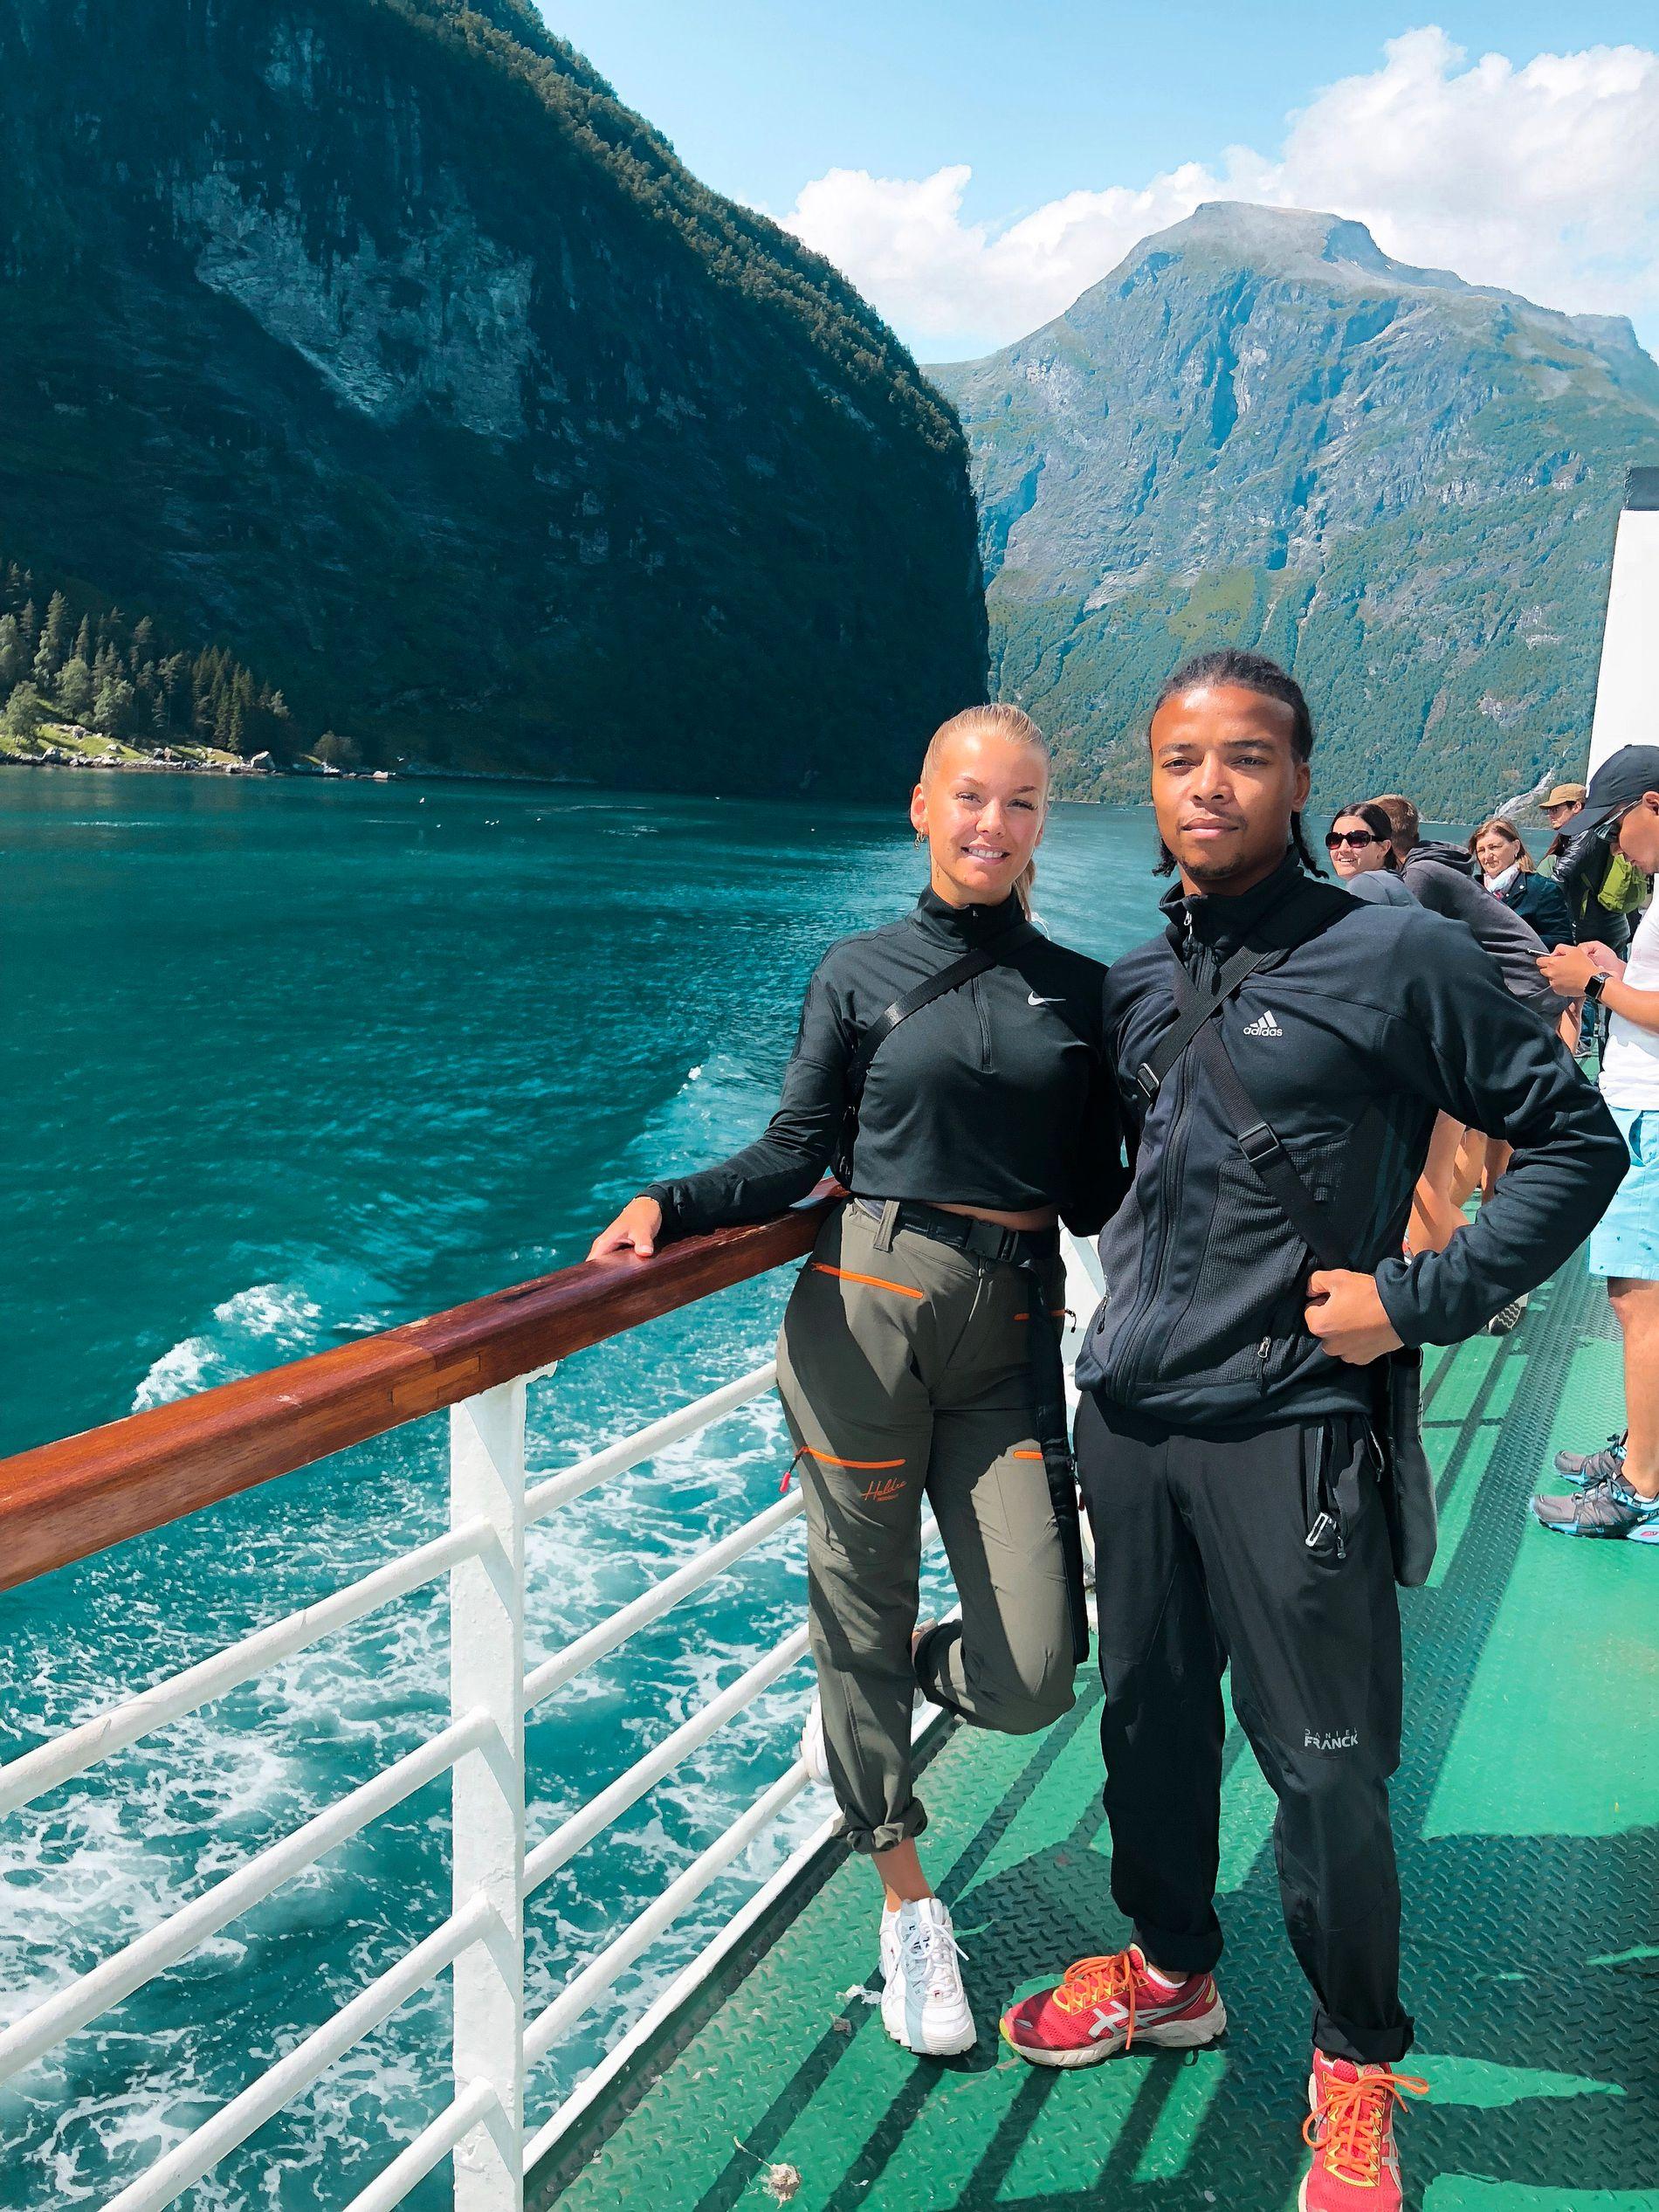 NORGESTUR: Kjæresteparet Hedda Halstvedt (23) og Johannes Unum (26) besøkte Haramsøy som en del av en ukelang bilferie langs Norges kyst.